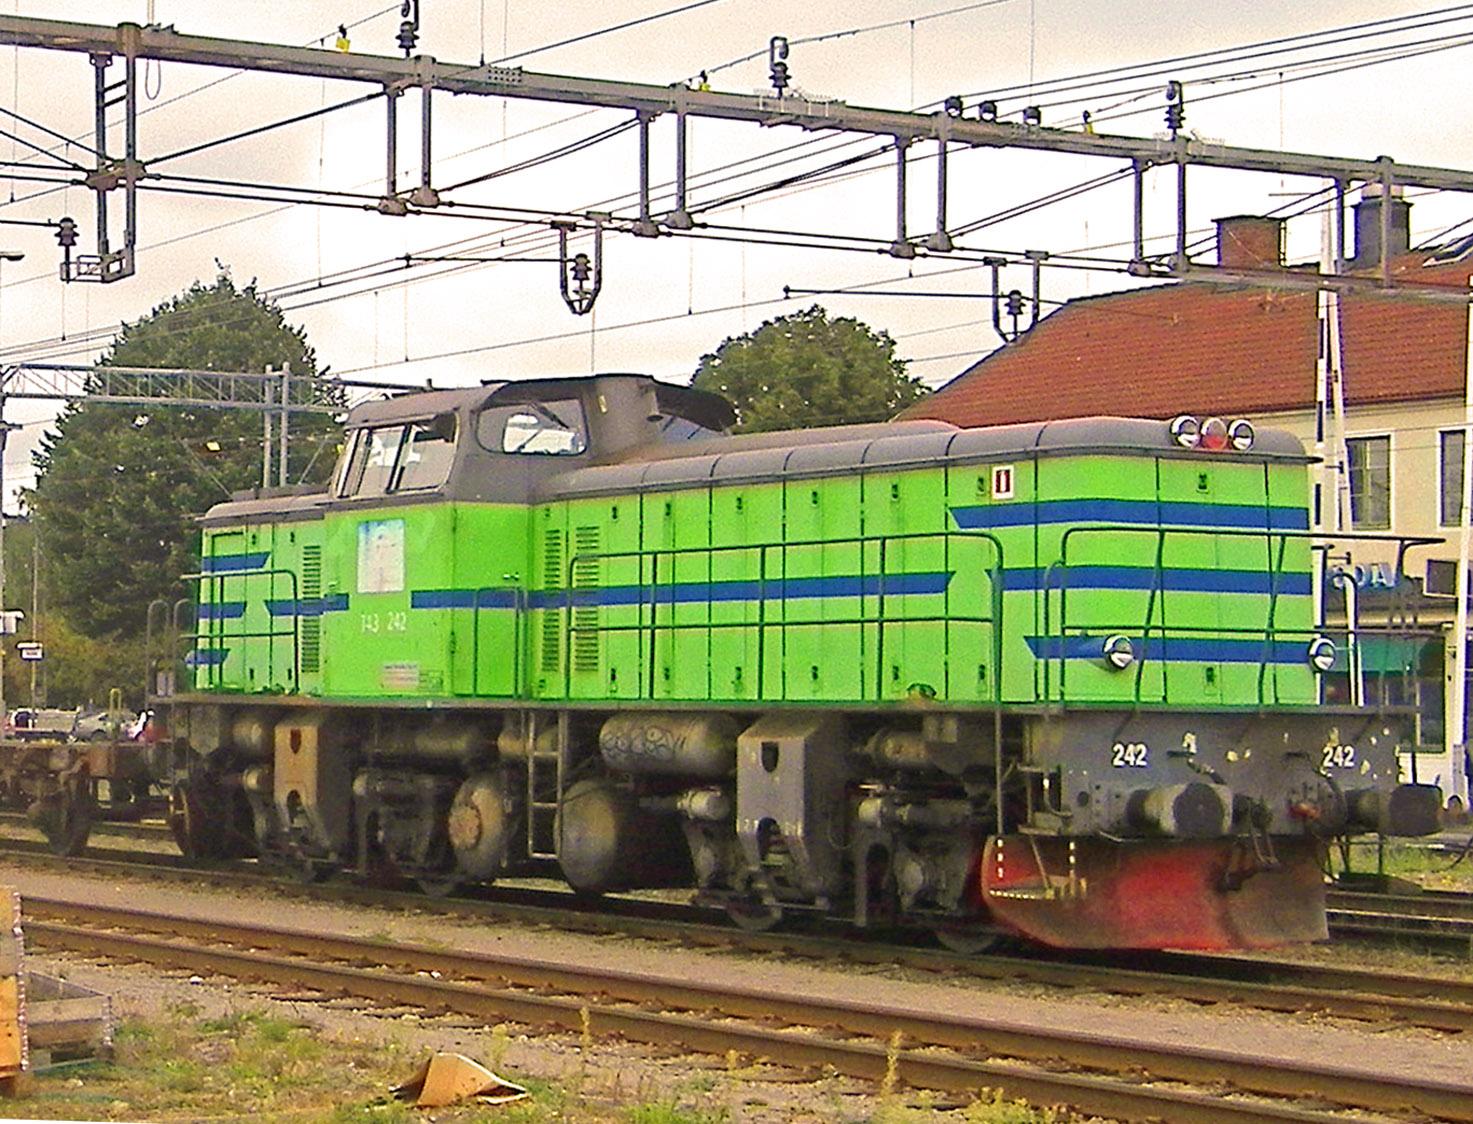 1bb Emmaboda, trafotåg, T43.242, sep.2013